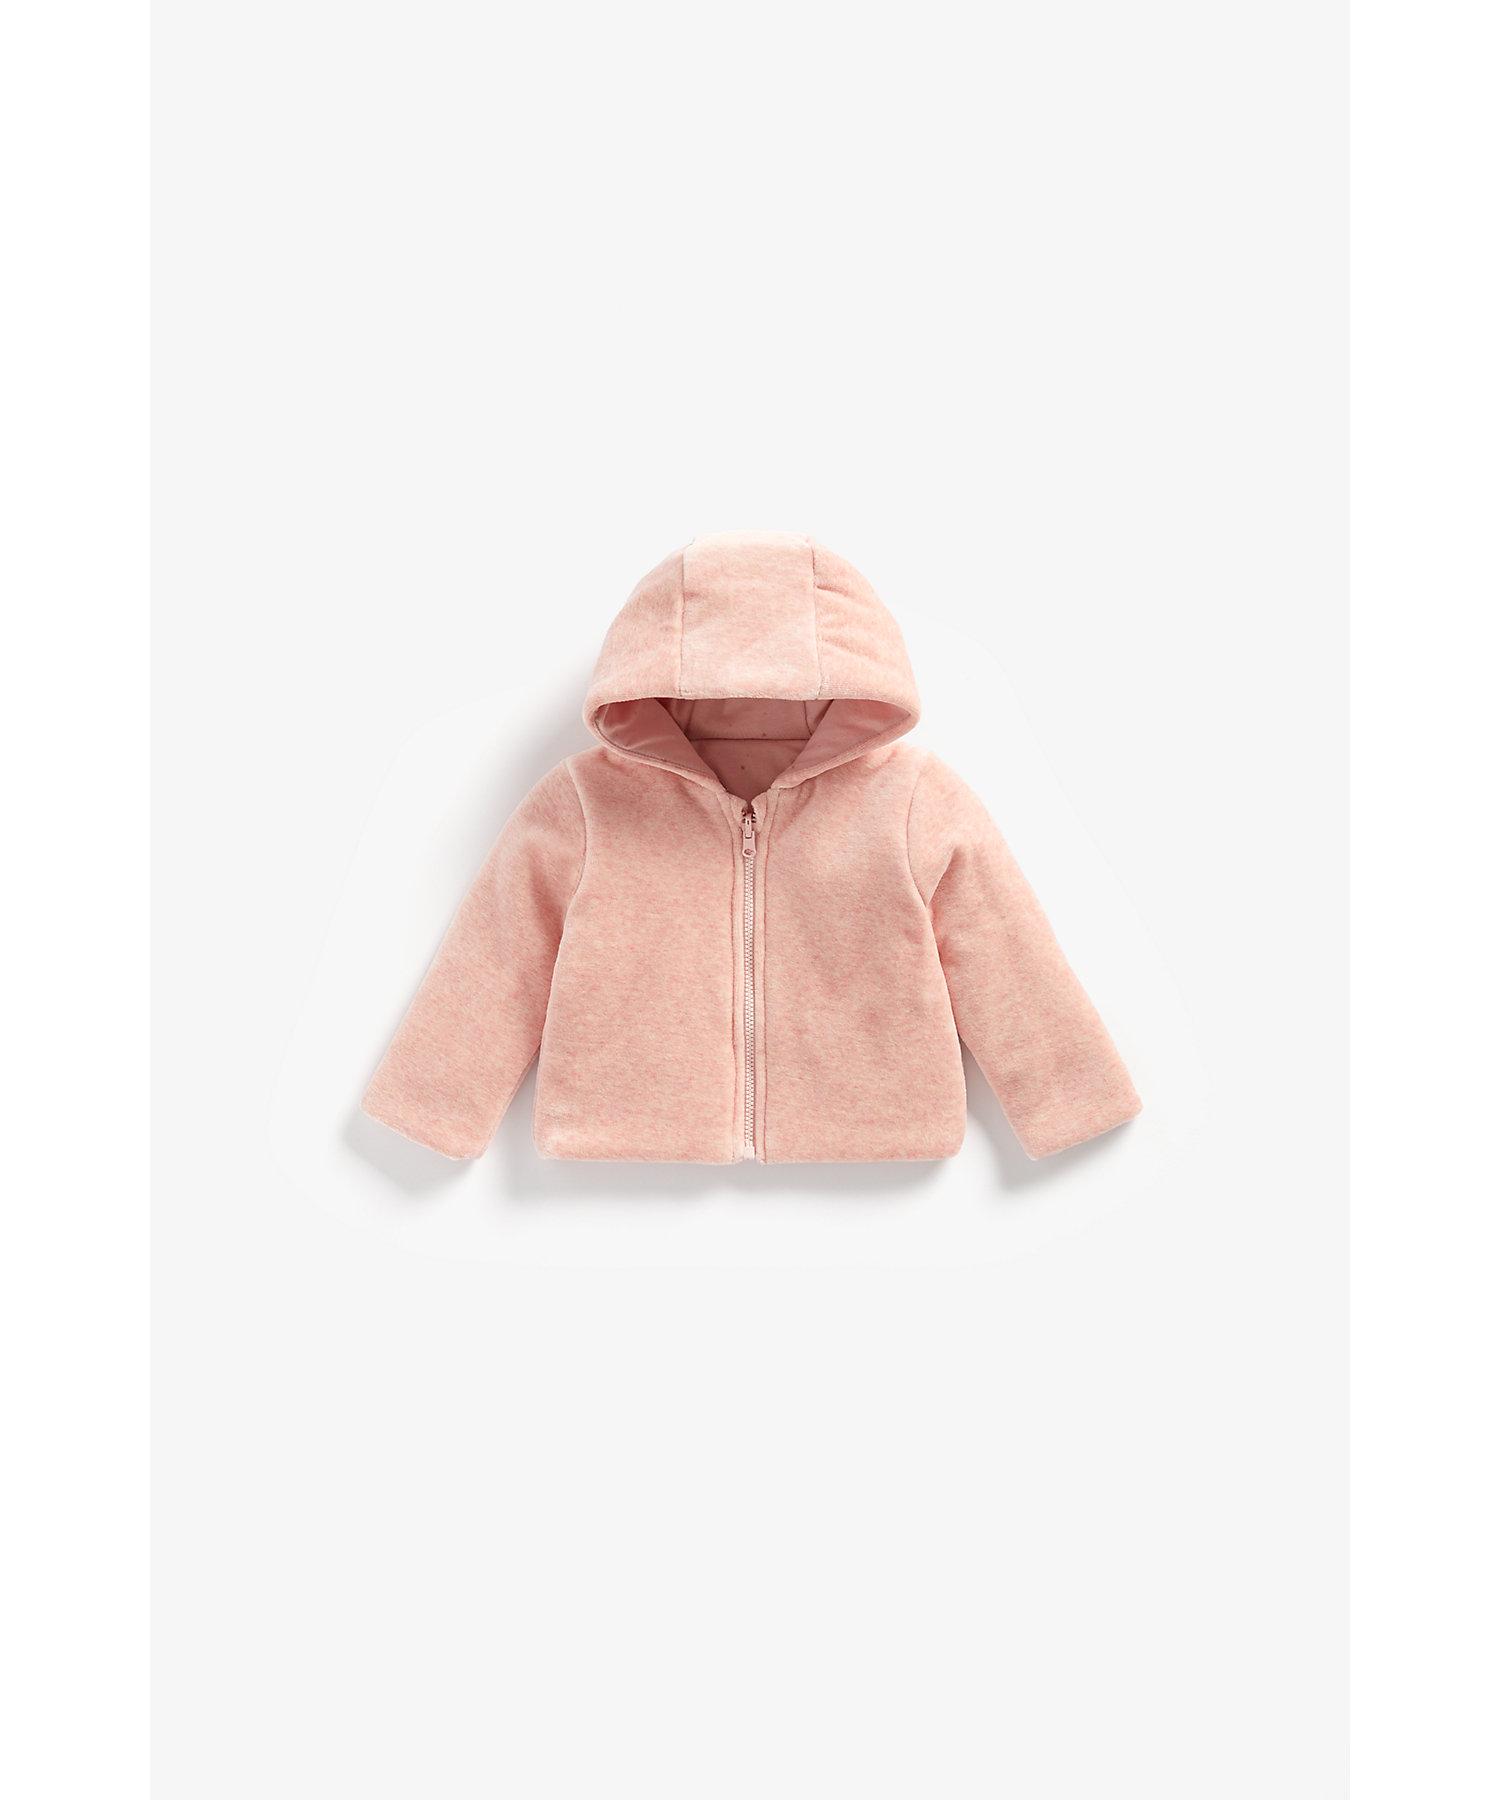 Mothercare | Girls Full Sleeves Reversible Velour Jacket Hooded - Pink